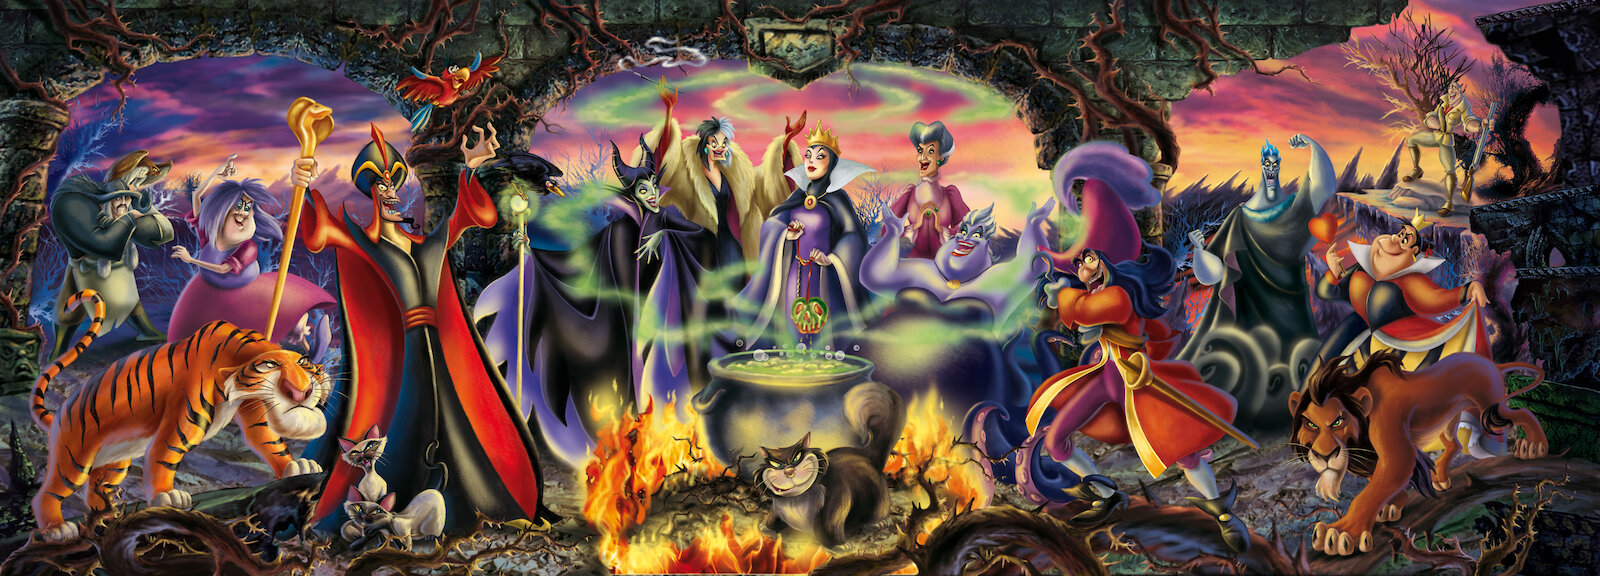 Disney Villains/Gallery